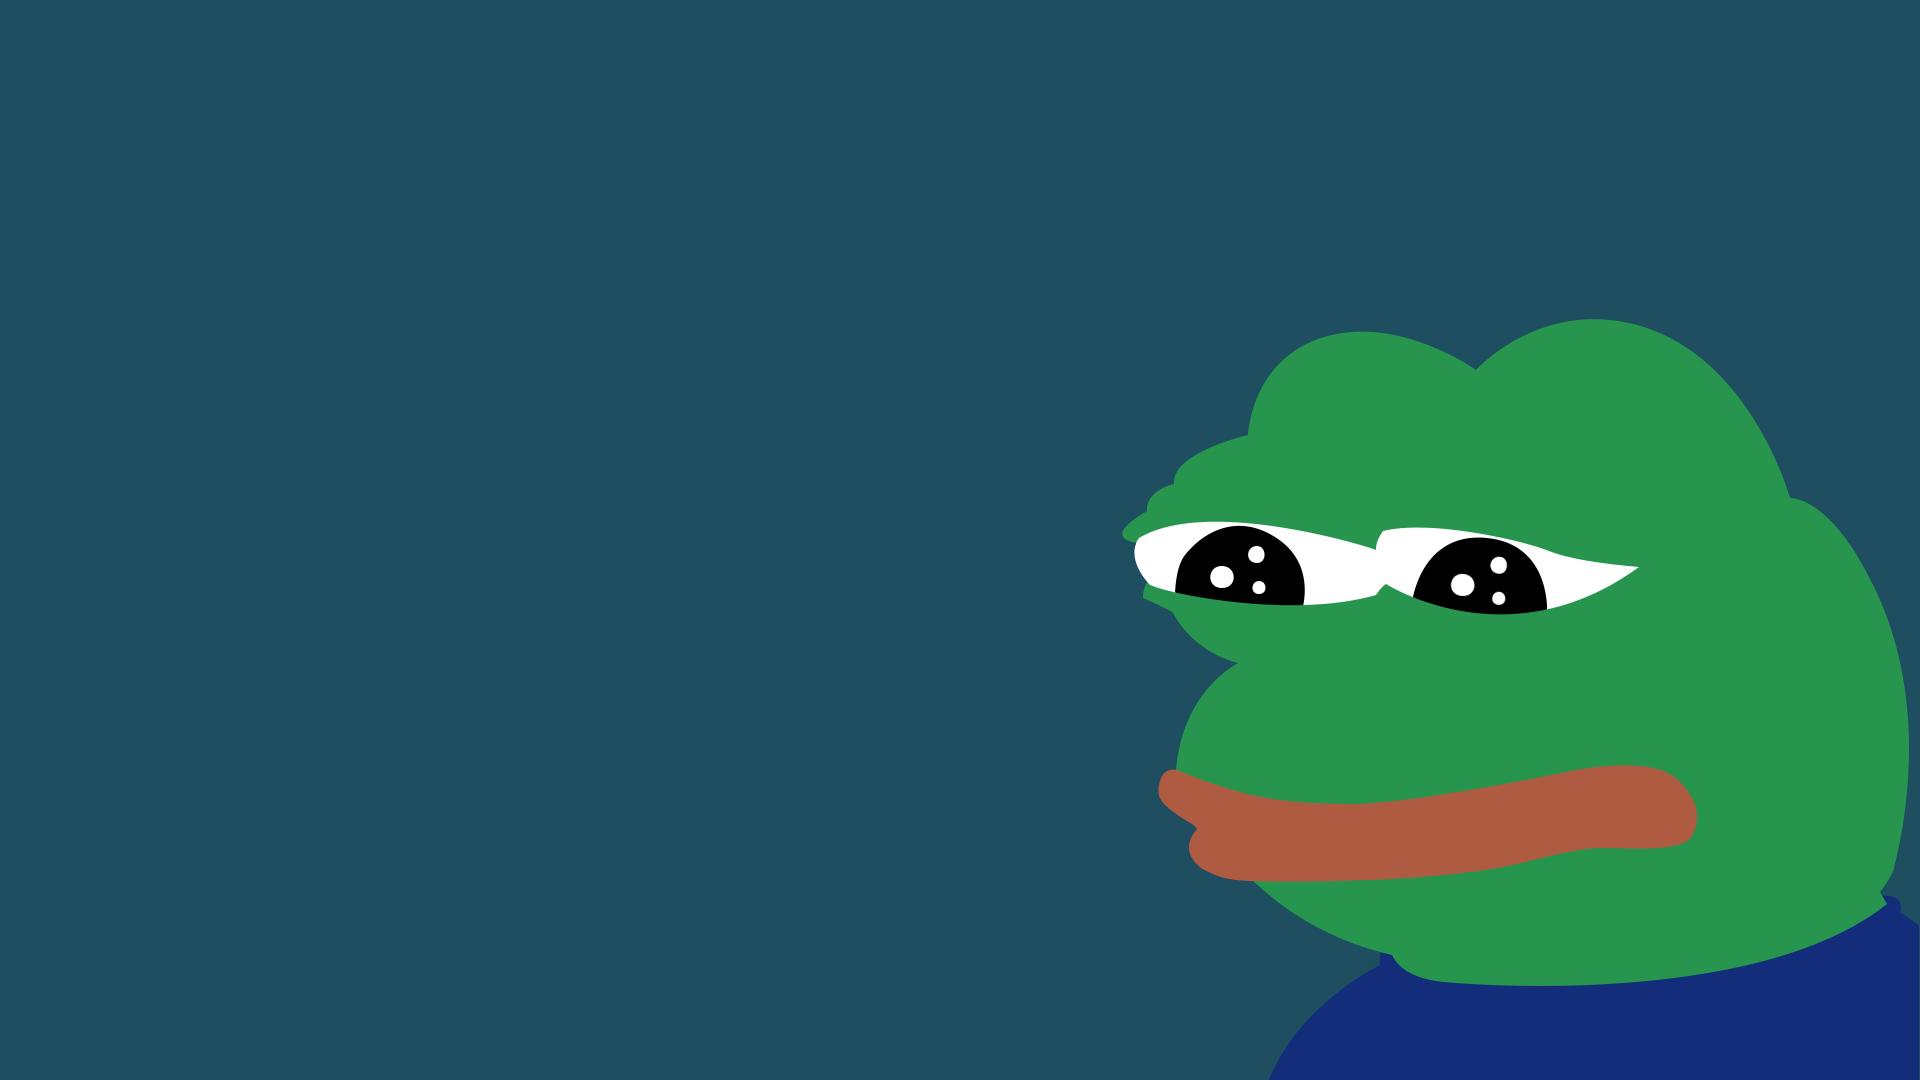 Pepe The Frog Wallpaper 4k - HD Wallpaper